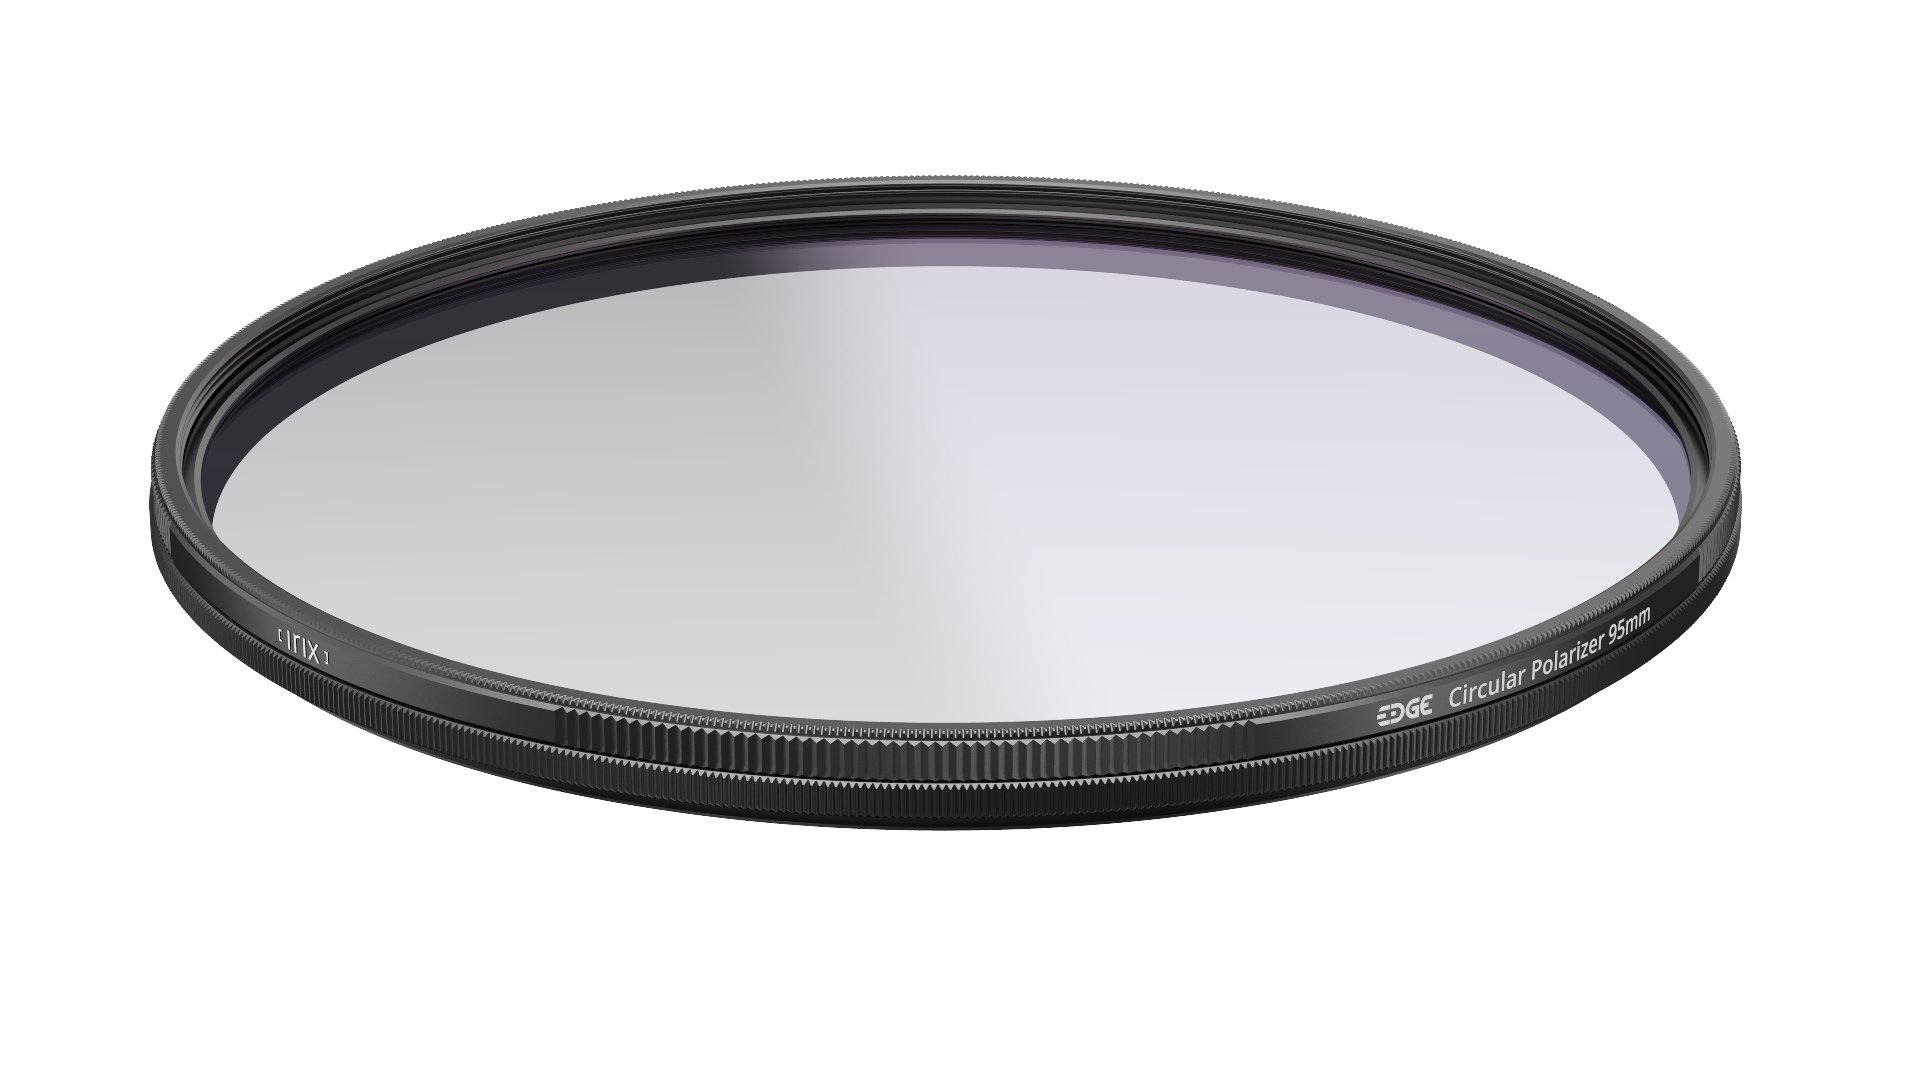 IRIX 95mm Edge Circular Polarizer Filter by Irix